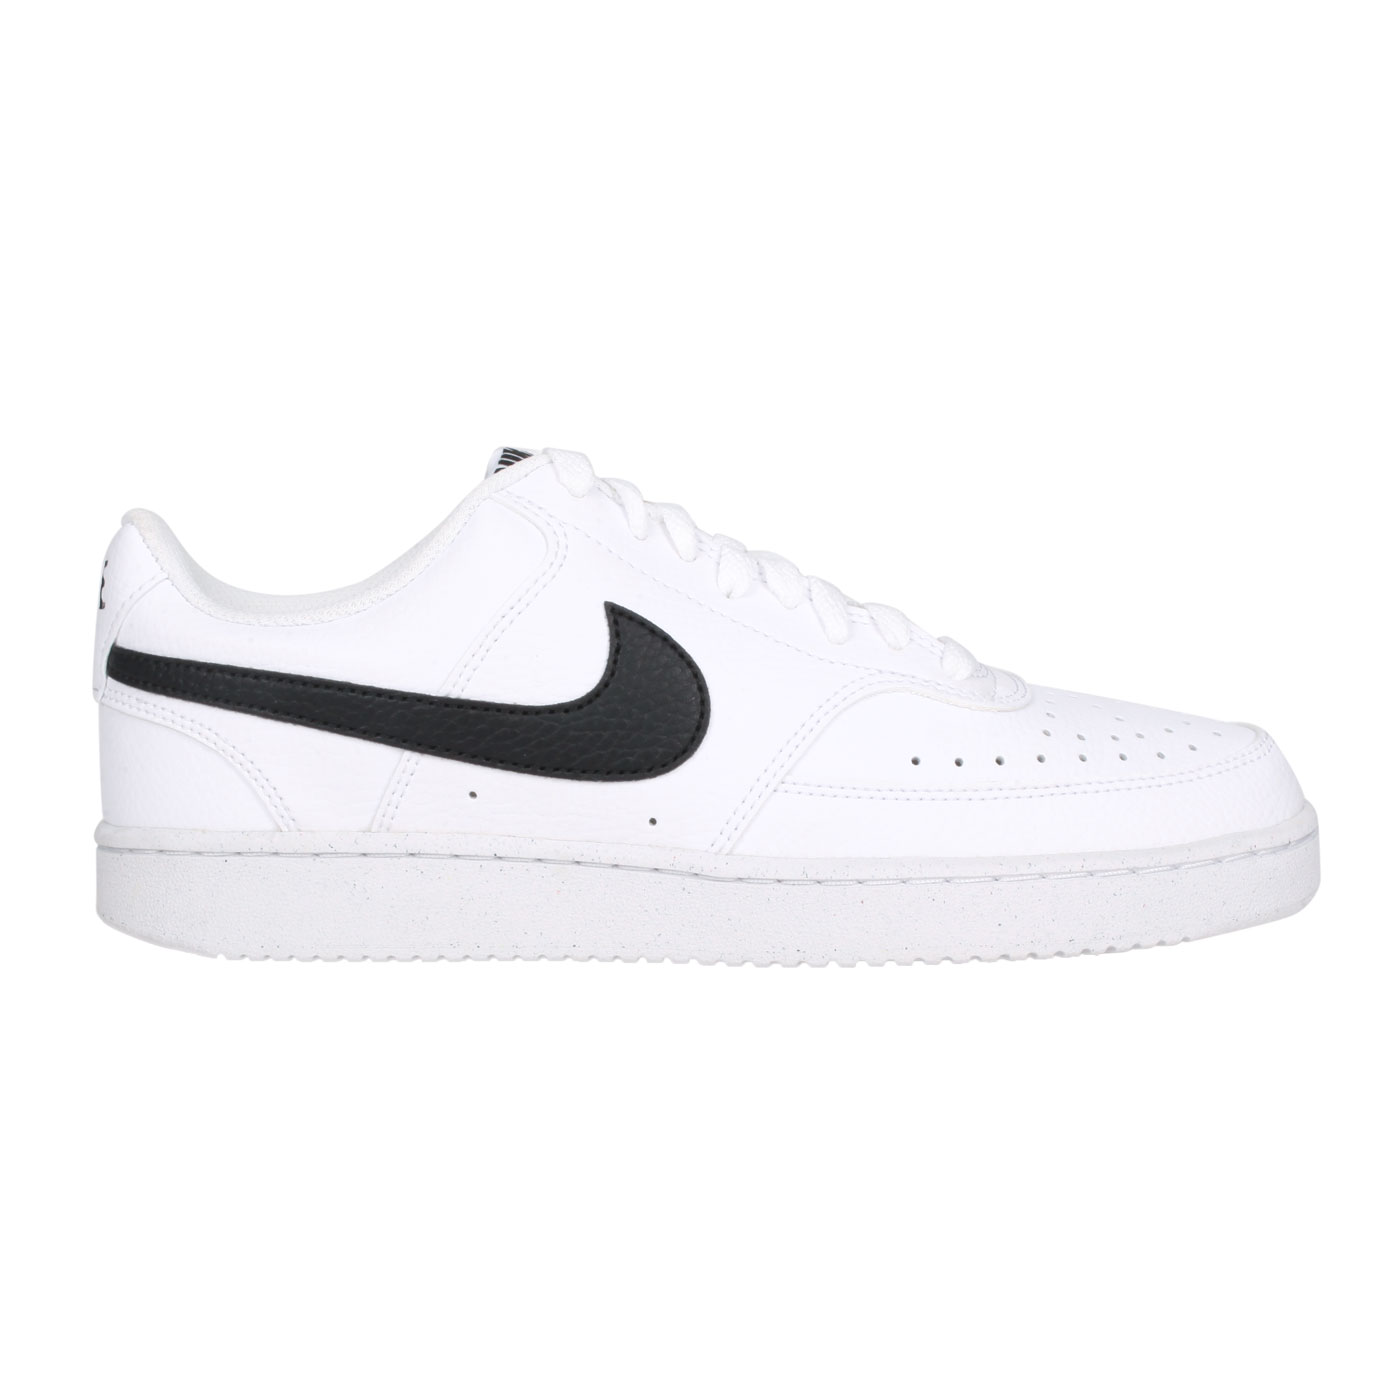 NIKE 男女休閒運動鞋  @COURT VISION LO NN@DH2987-101 - 白黑